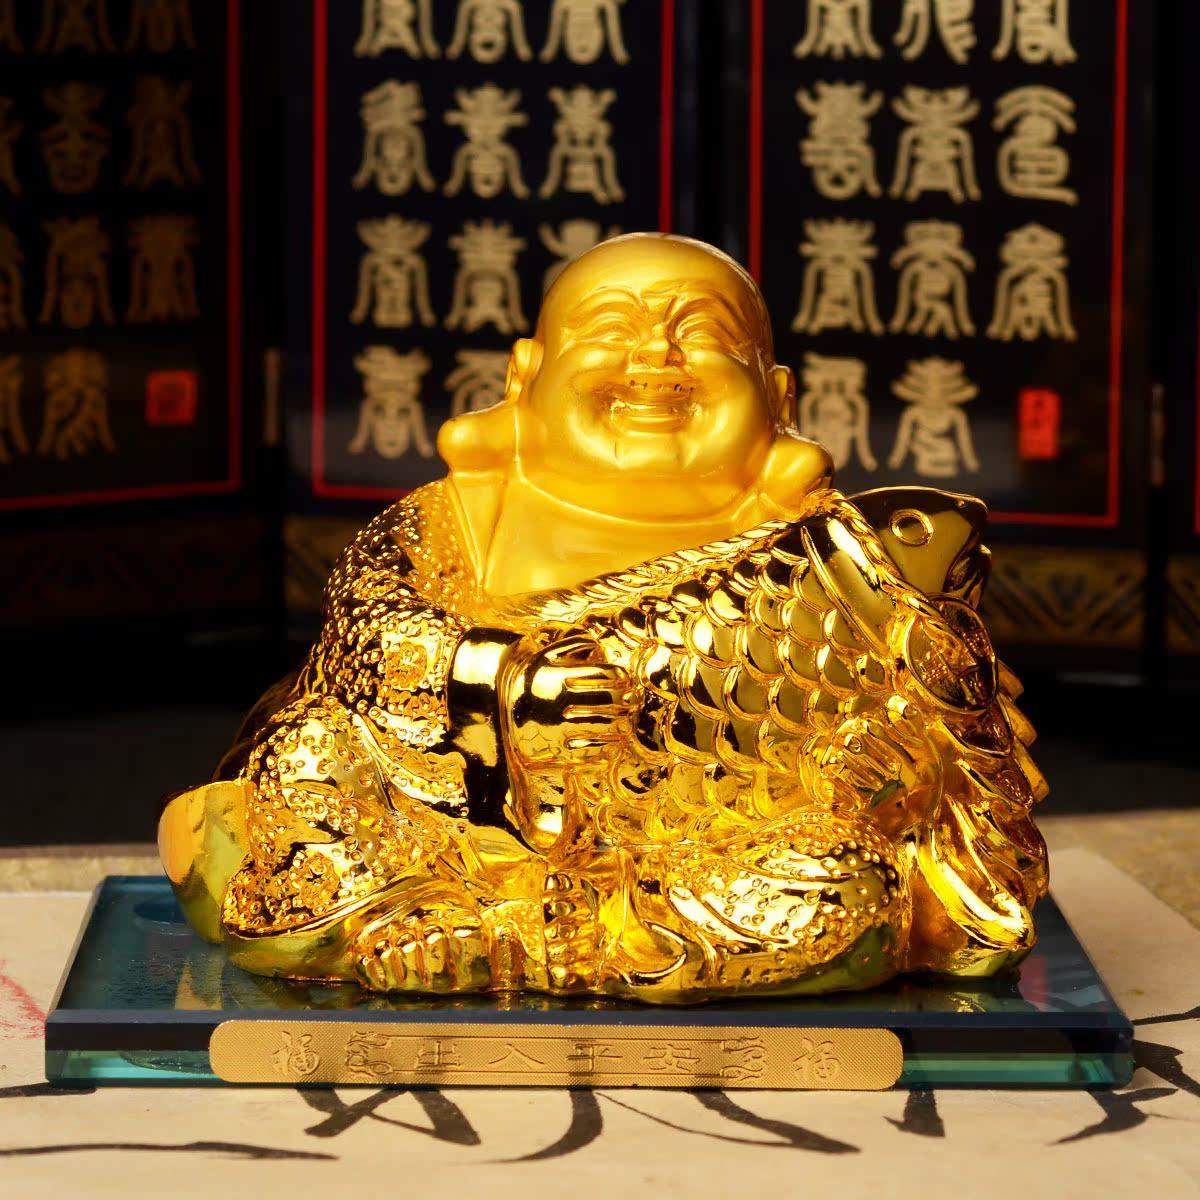 декоративное украшение Grand luck lady luck